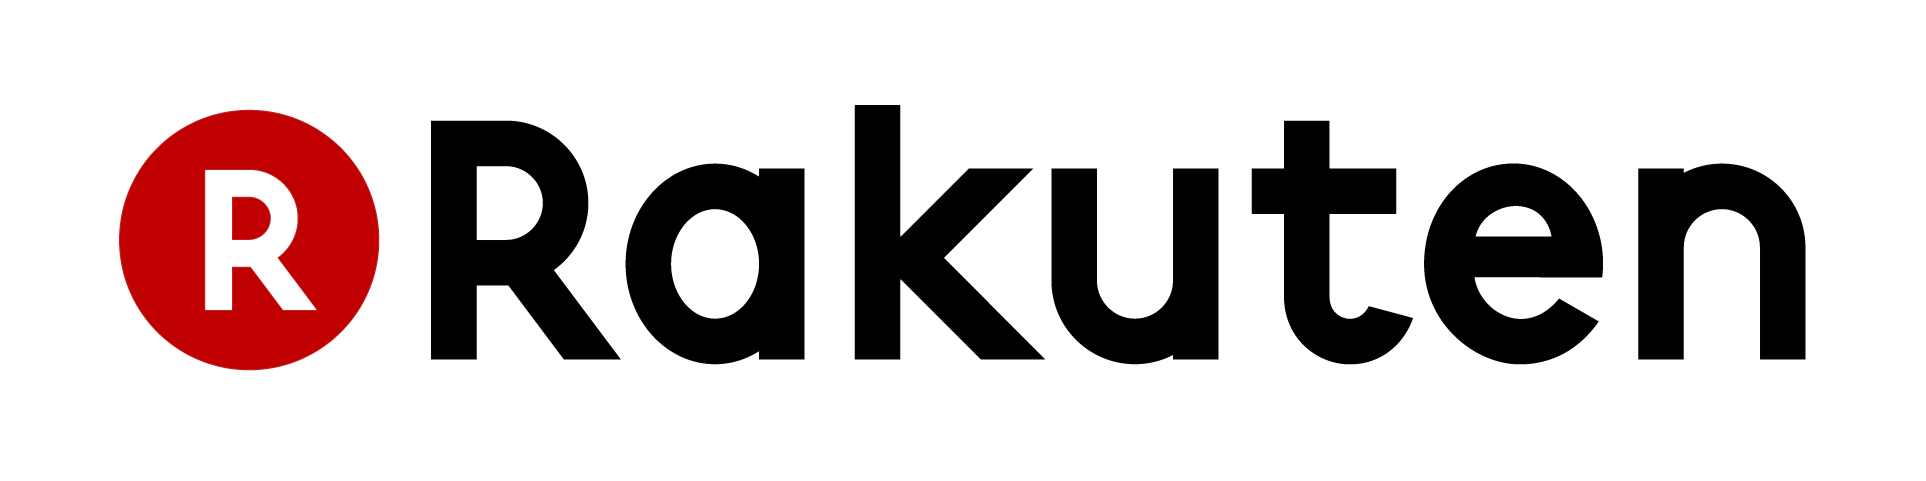 Rakuten affiliate products logo